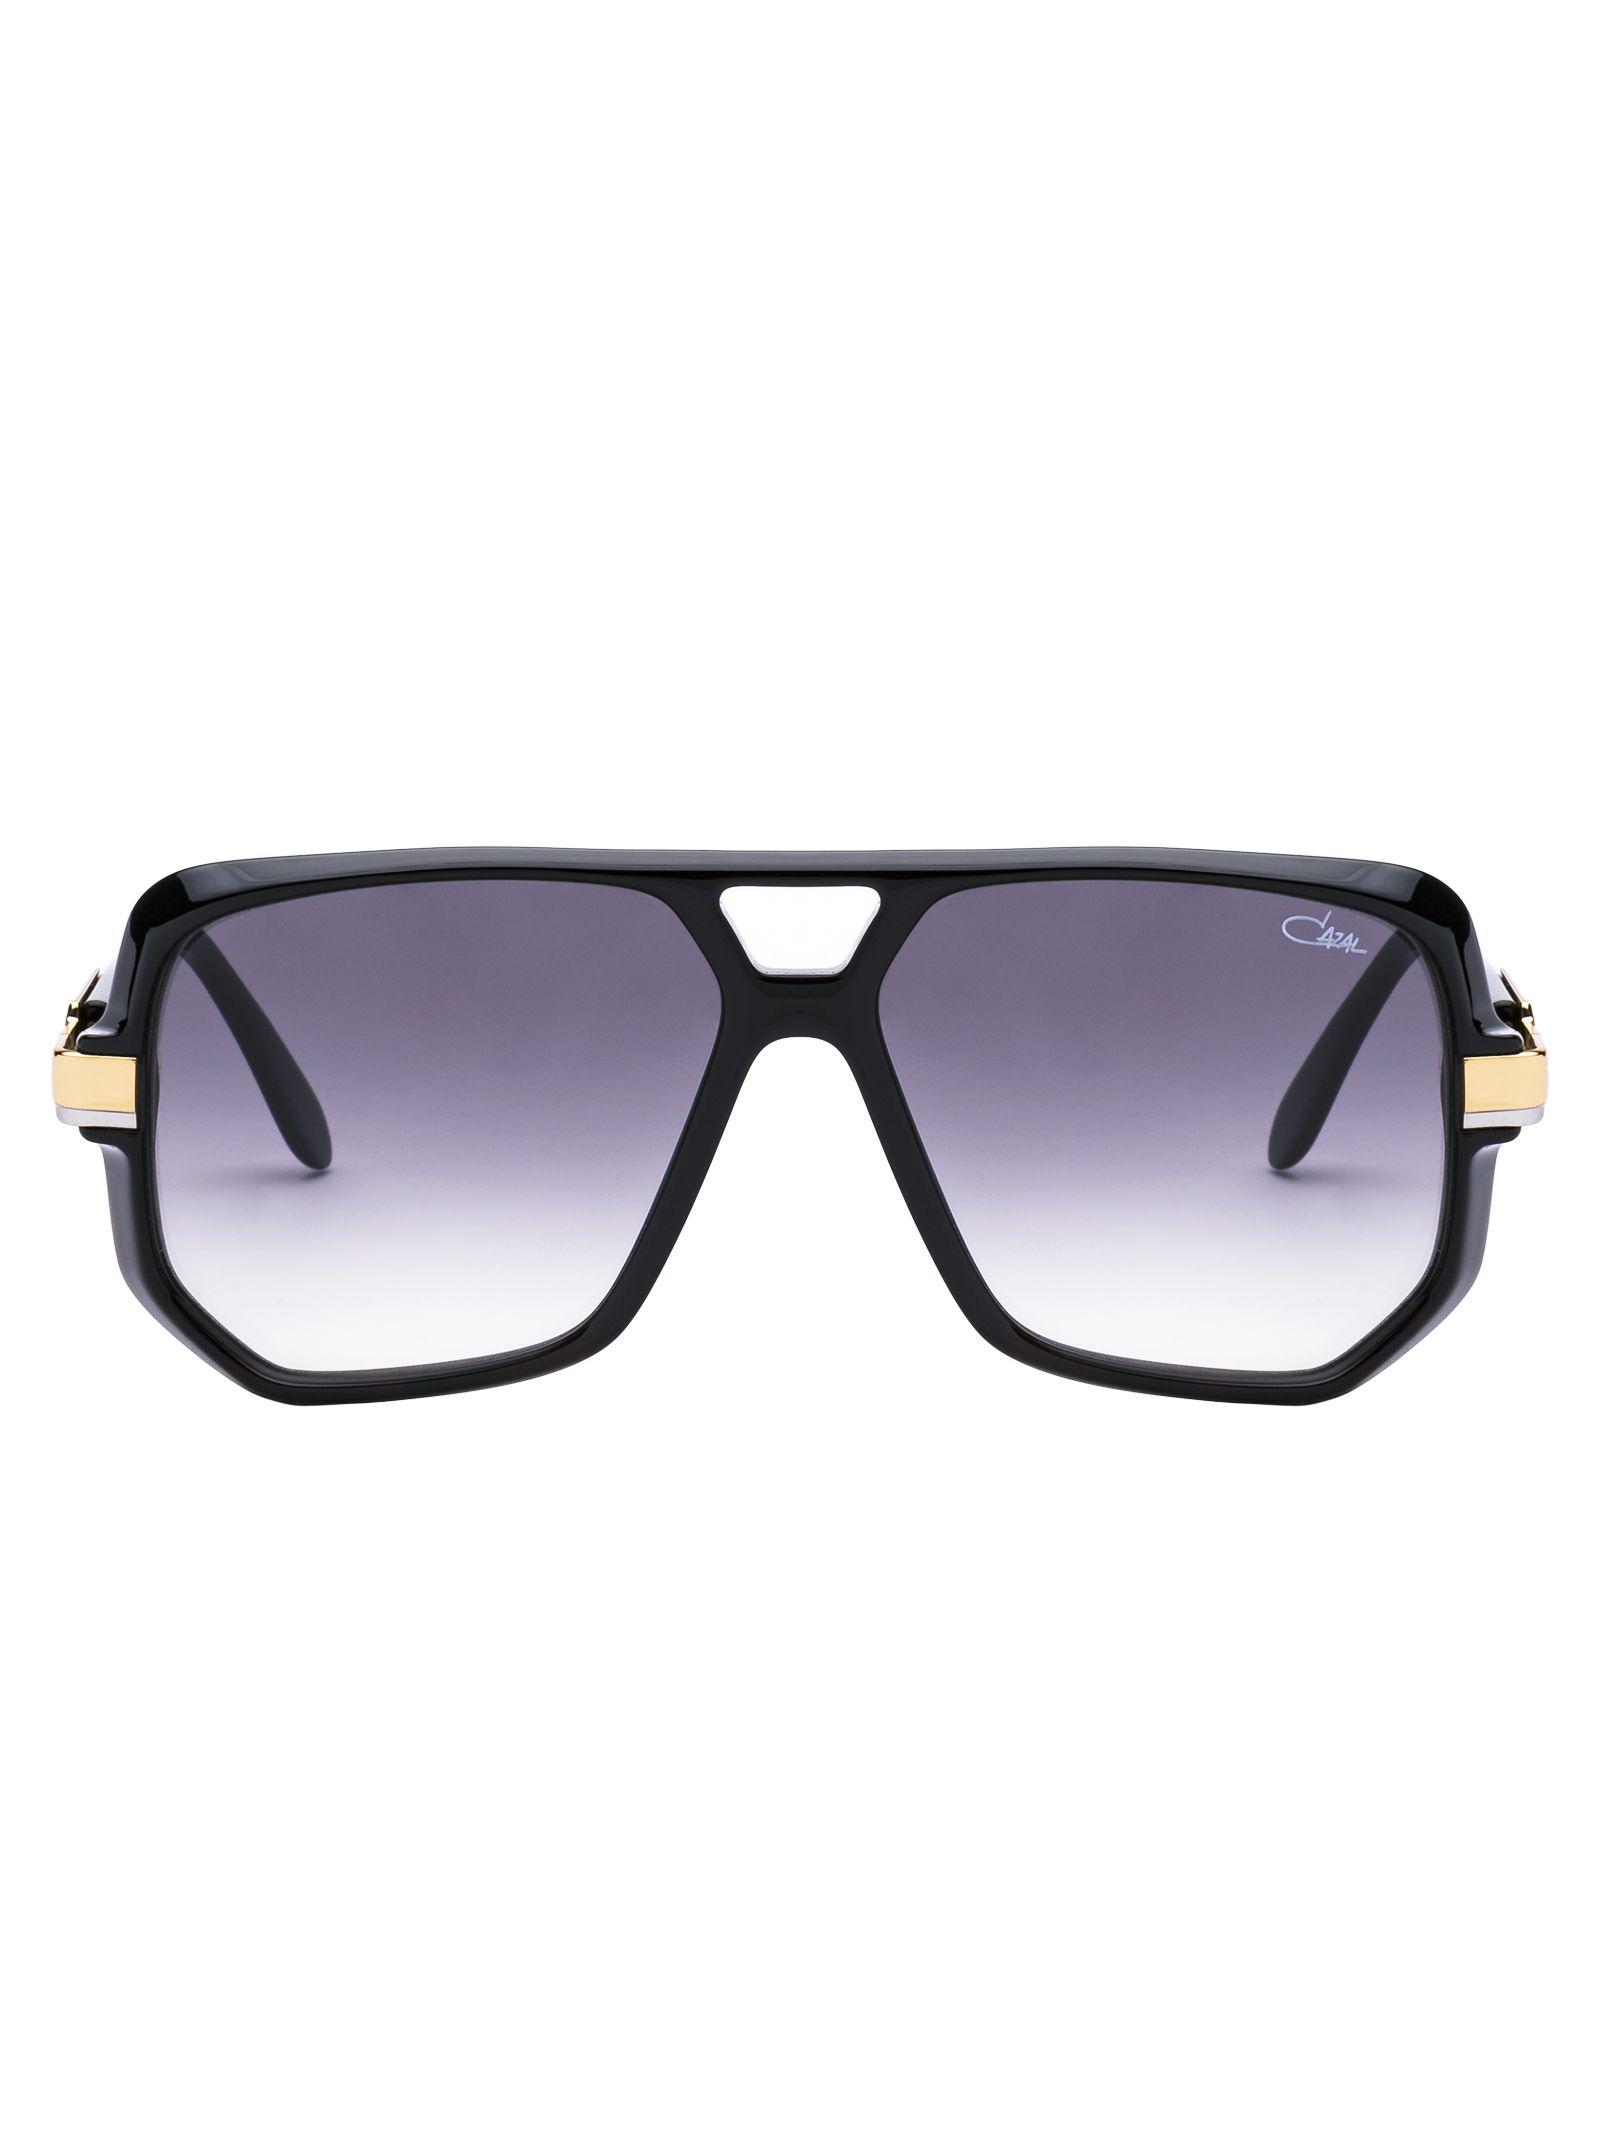 b3b0c261f7ee Cazal Aviator Sunglasses In C001